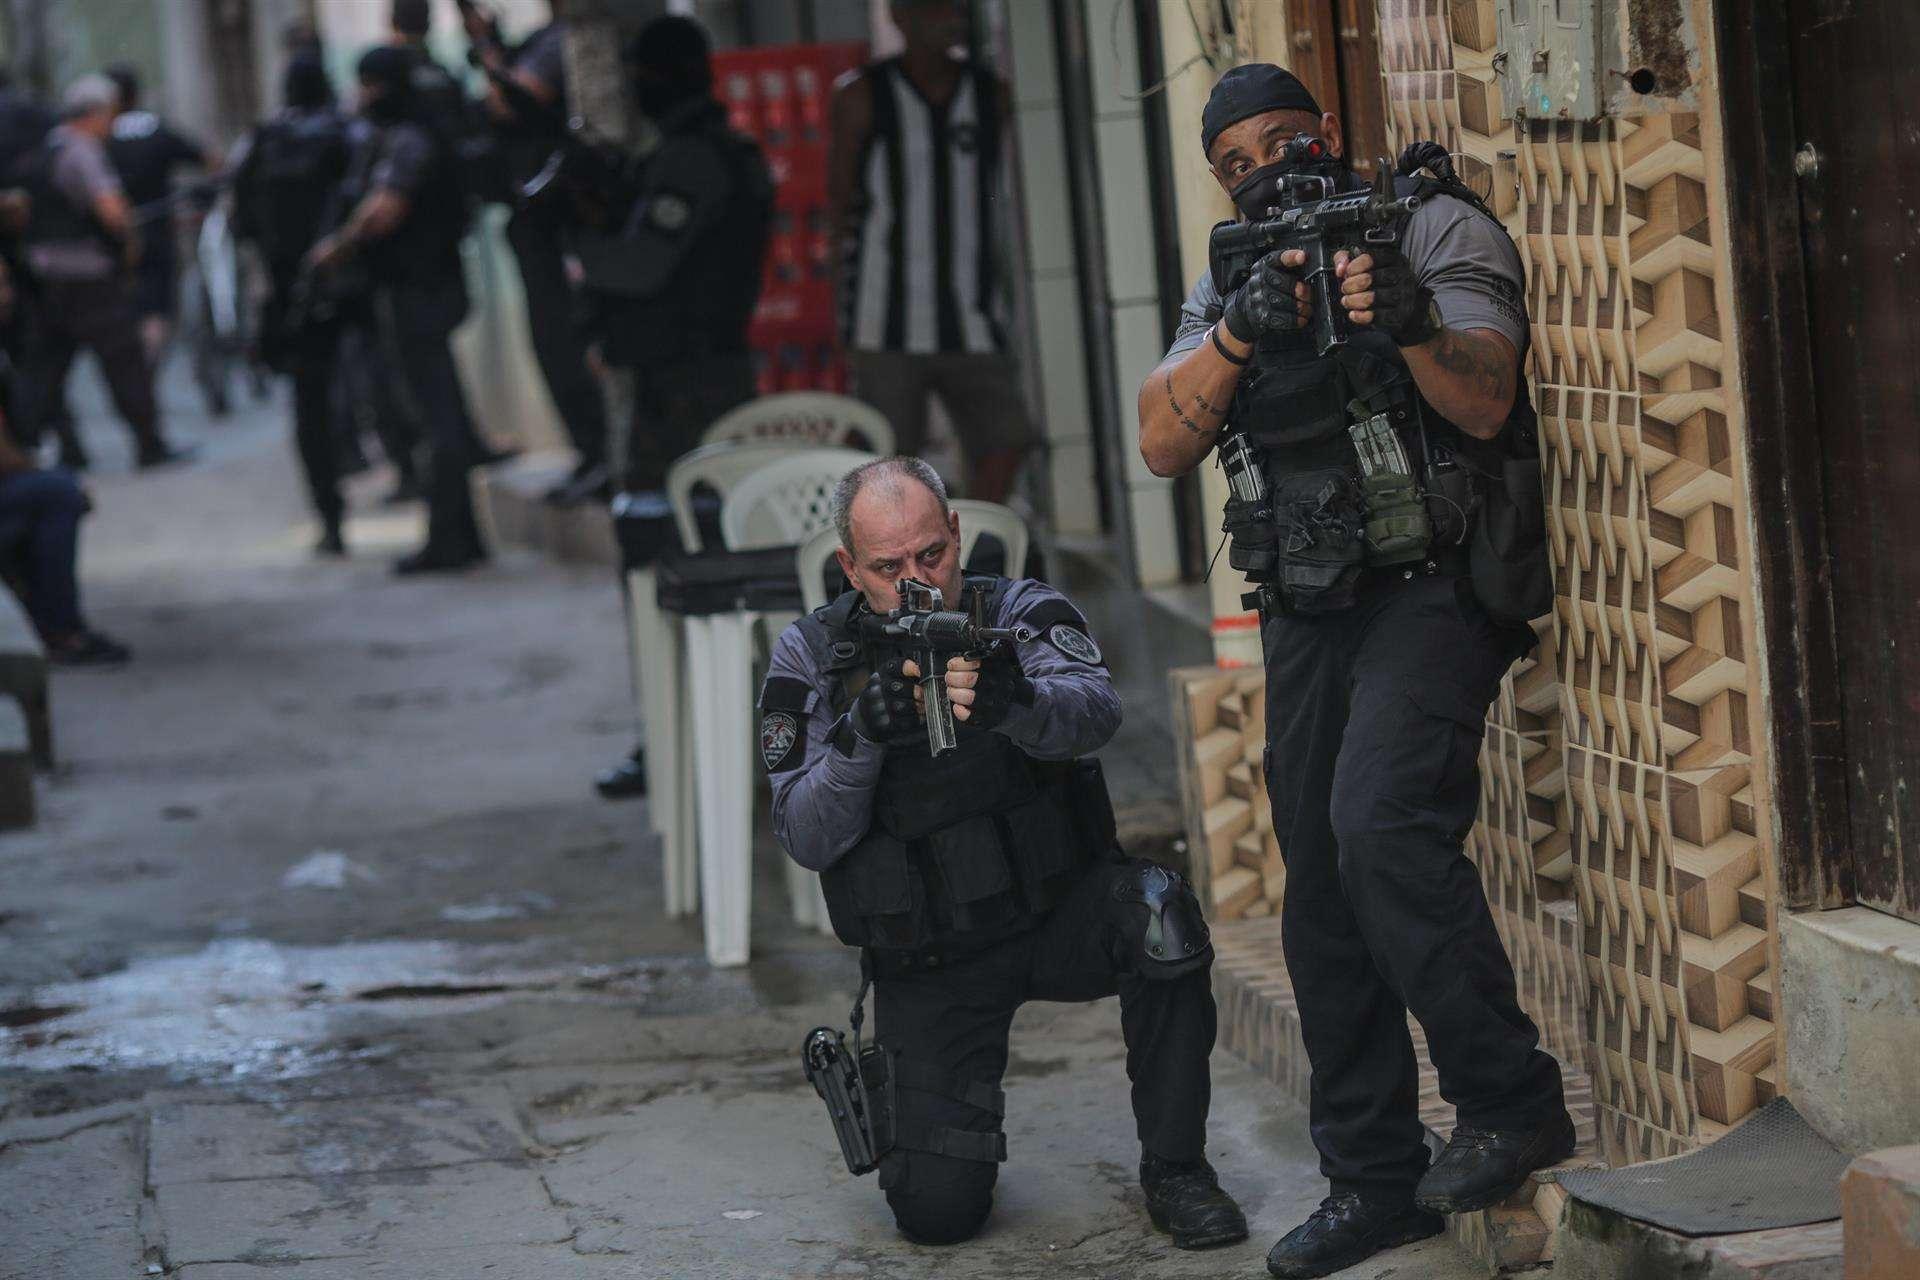 Operataivo policial en Río